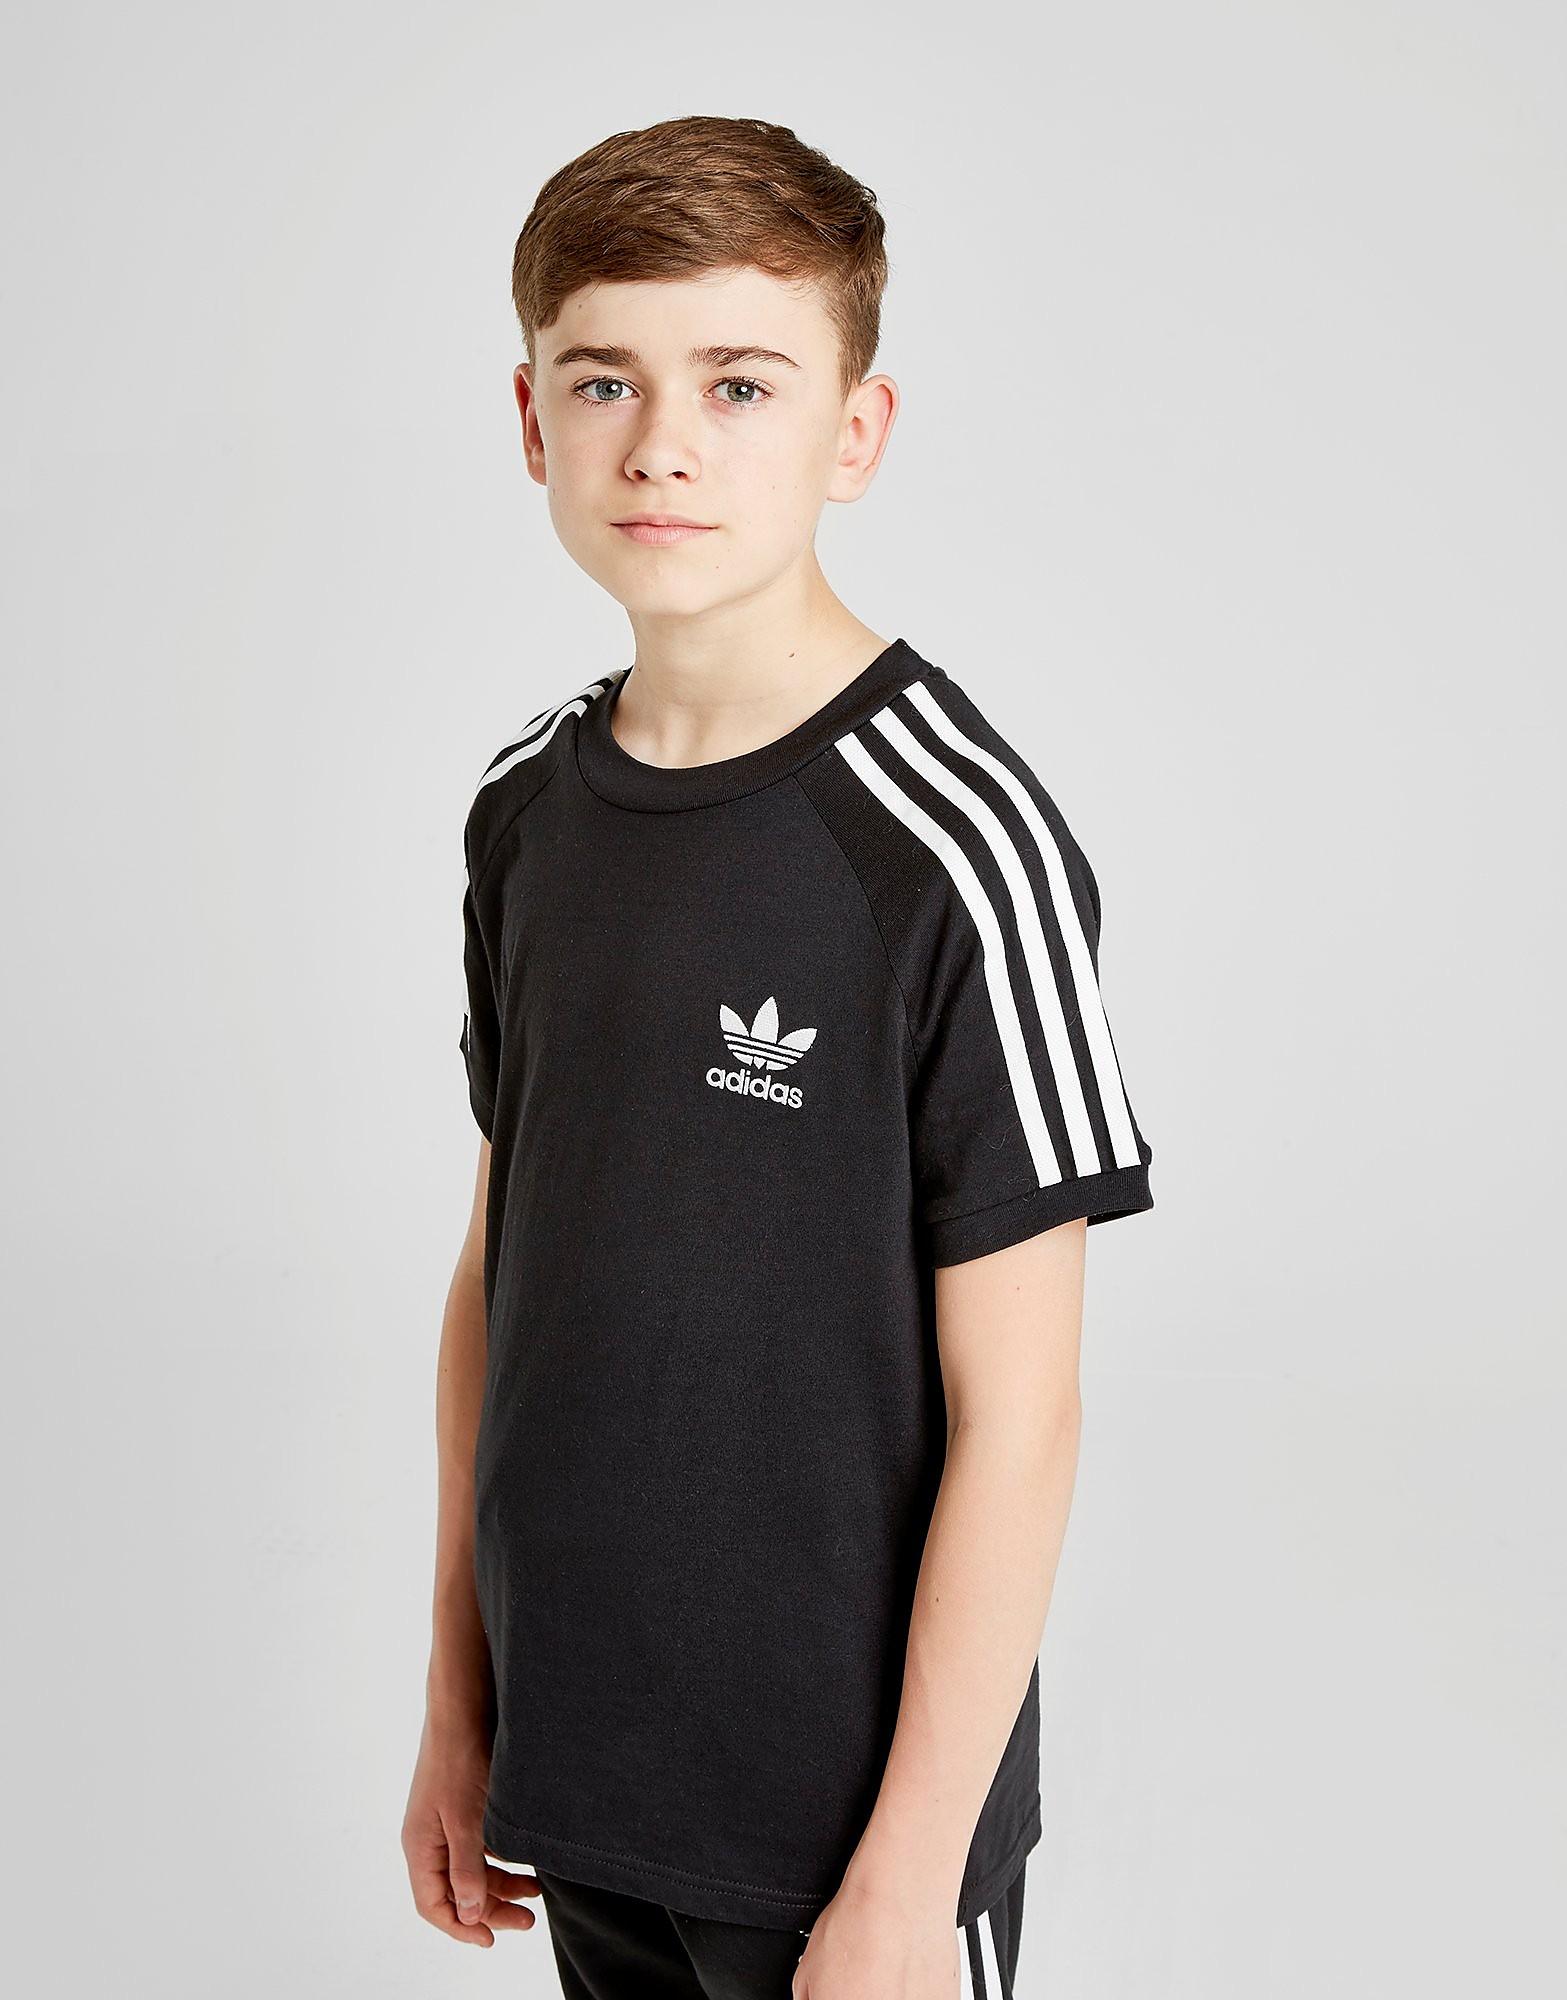 adidas Originals California T-Shirt Junior Schwarz-Weiß